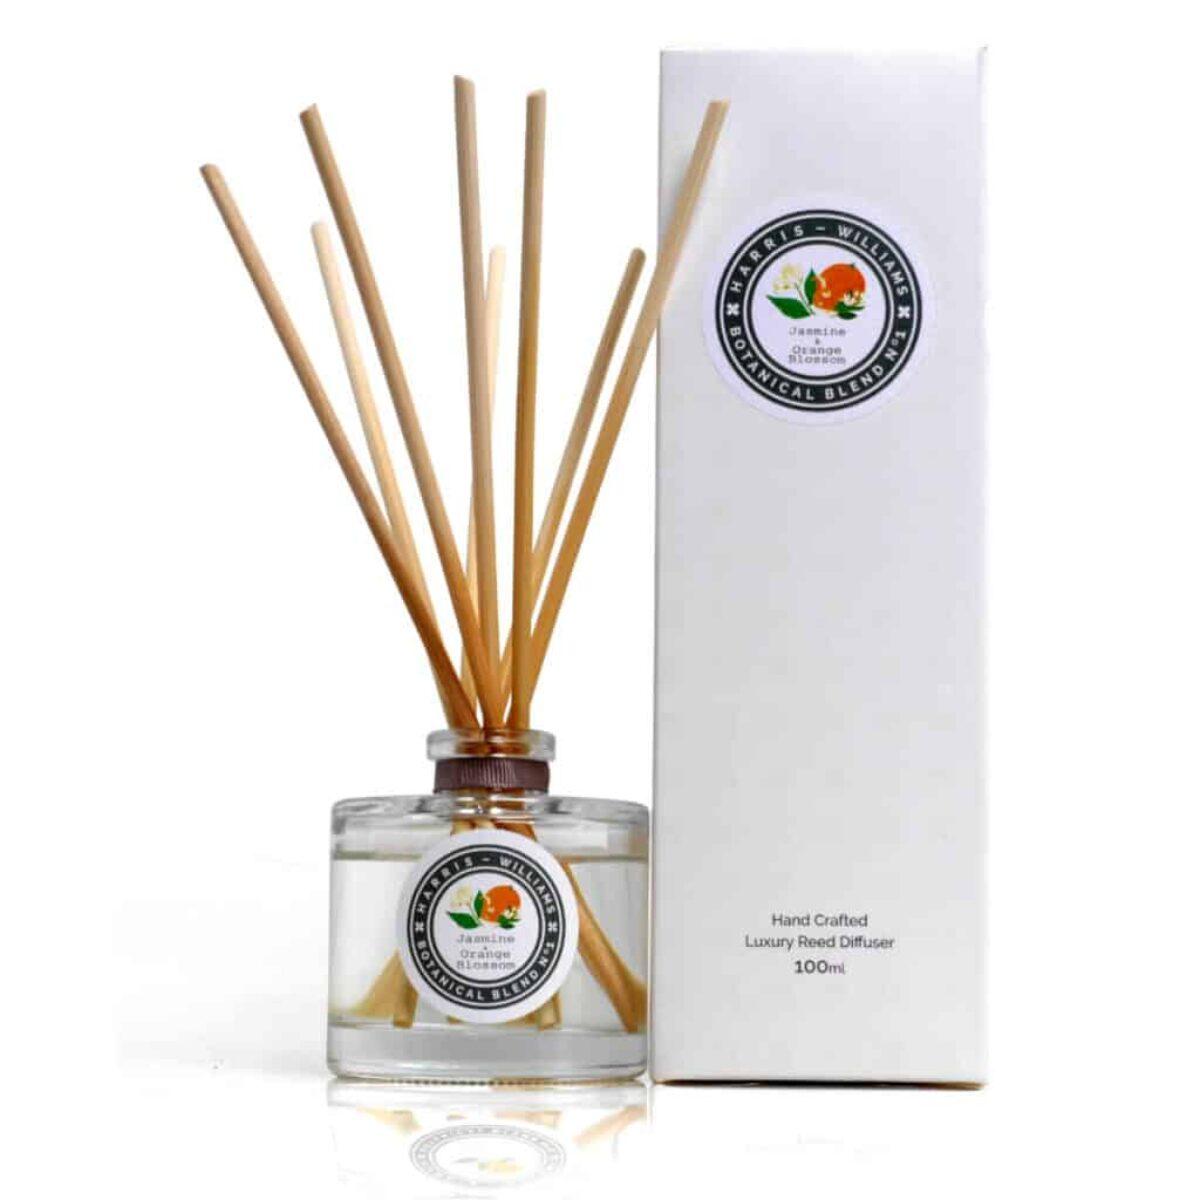 Botanical Blend No 1 Jasmine & Orange Reed Diffuser